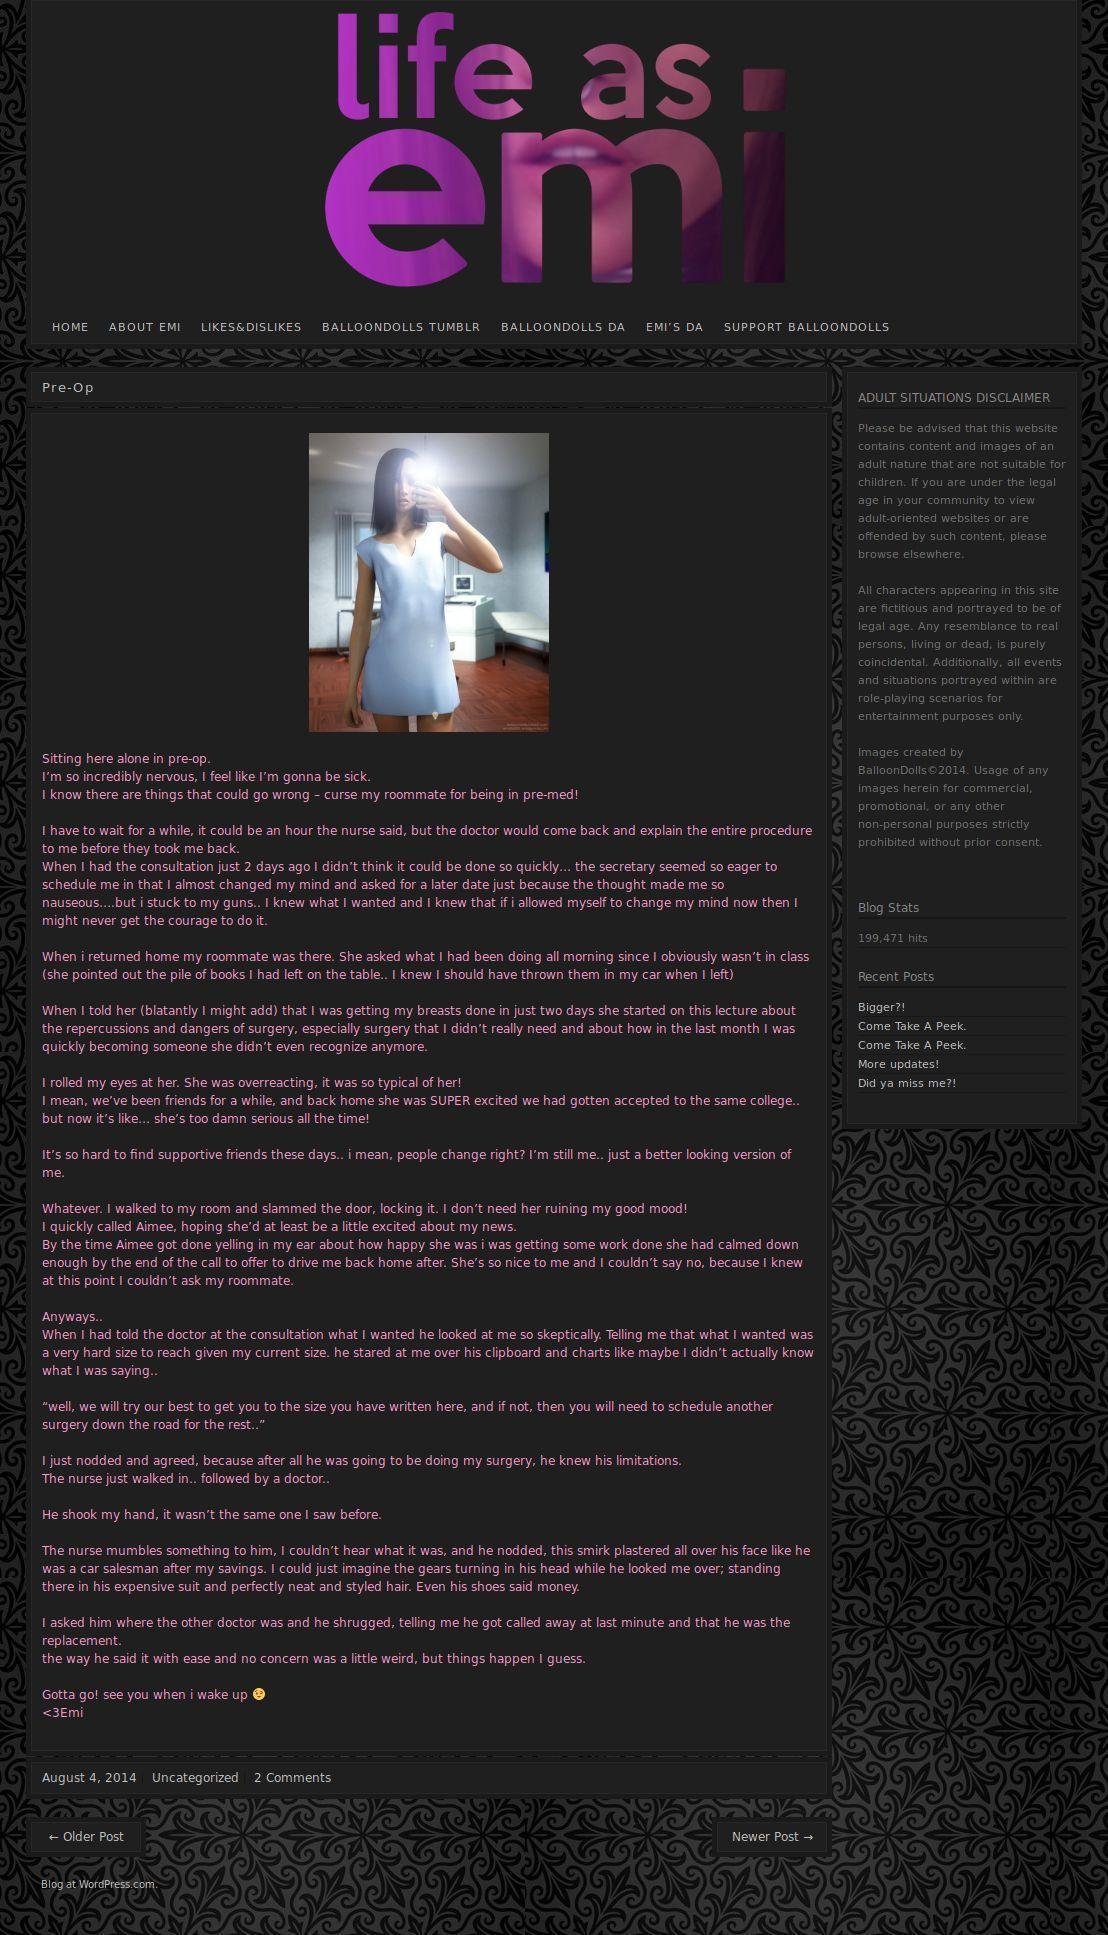 [Balloondolls] Life as EmiDoll (WP screengrab) - part 2